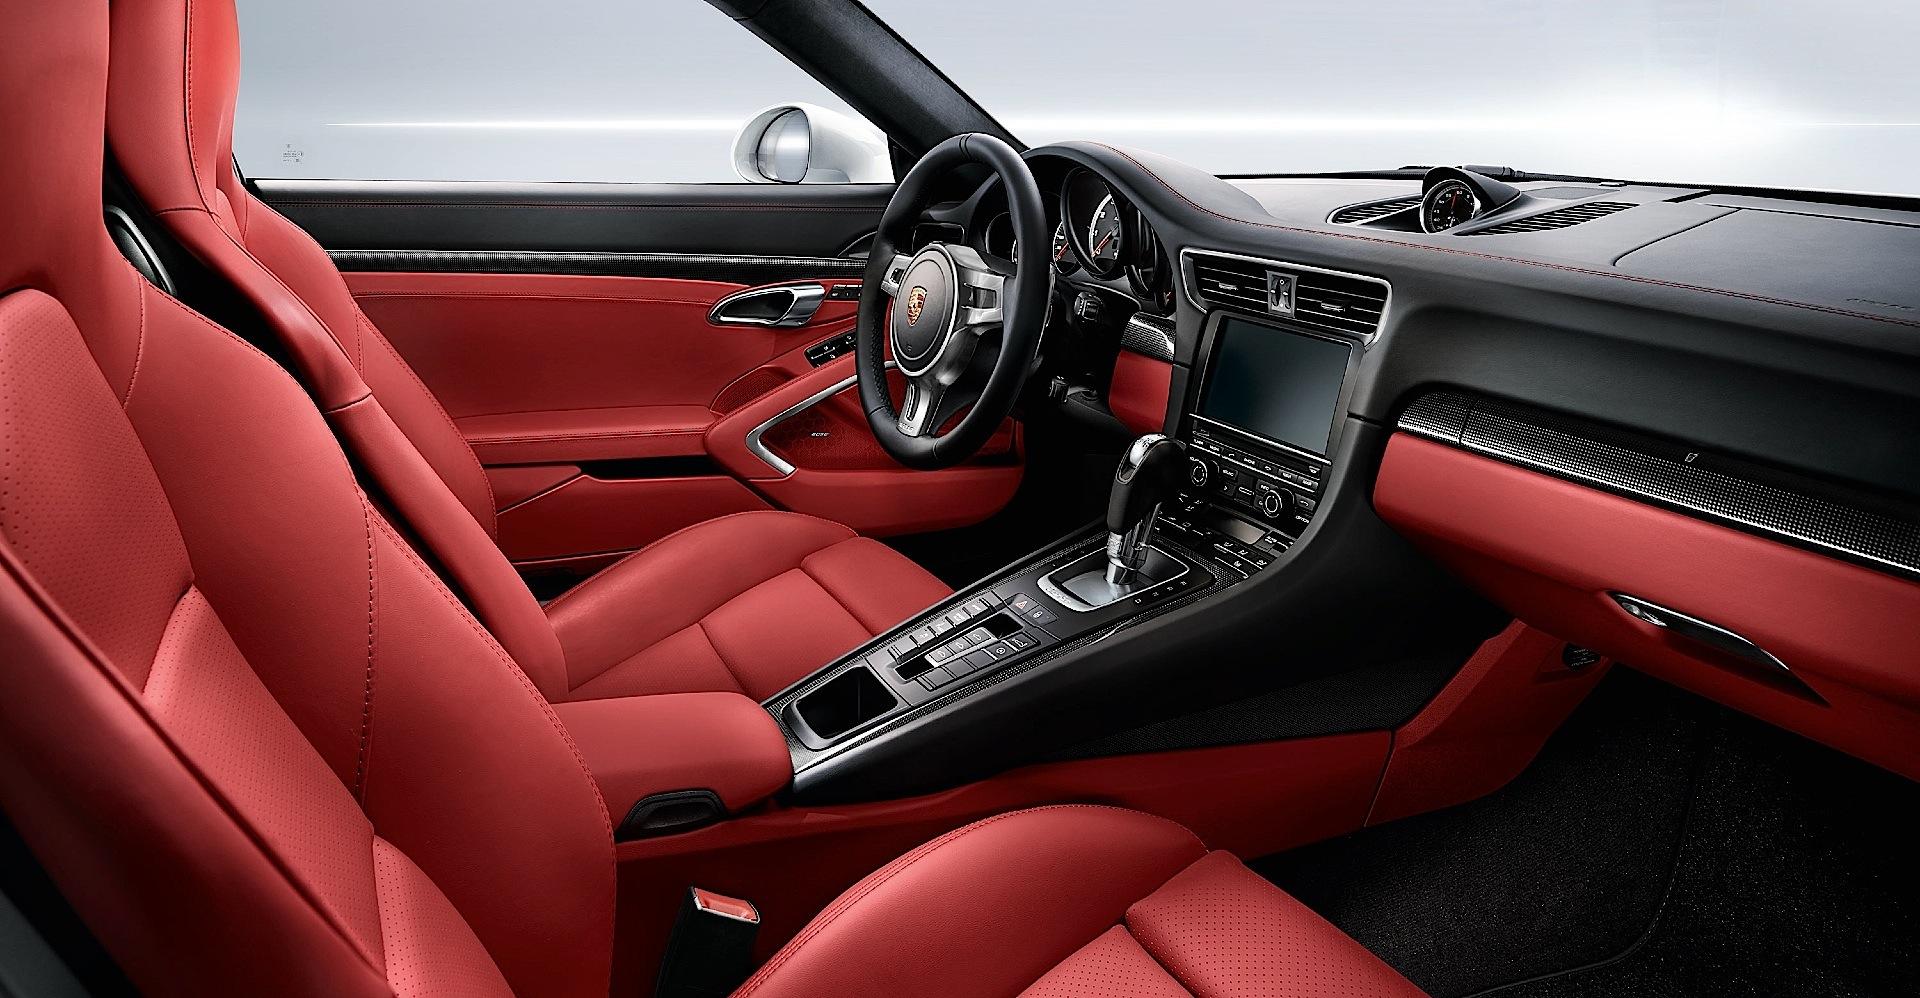 PORSCHE 911 Turbo S  991   2013 - Present Porsche 991 Turbo Interior